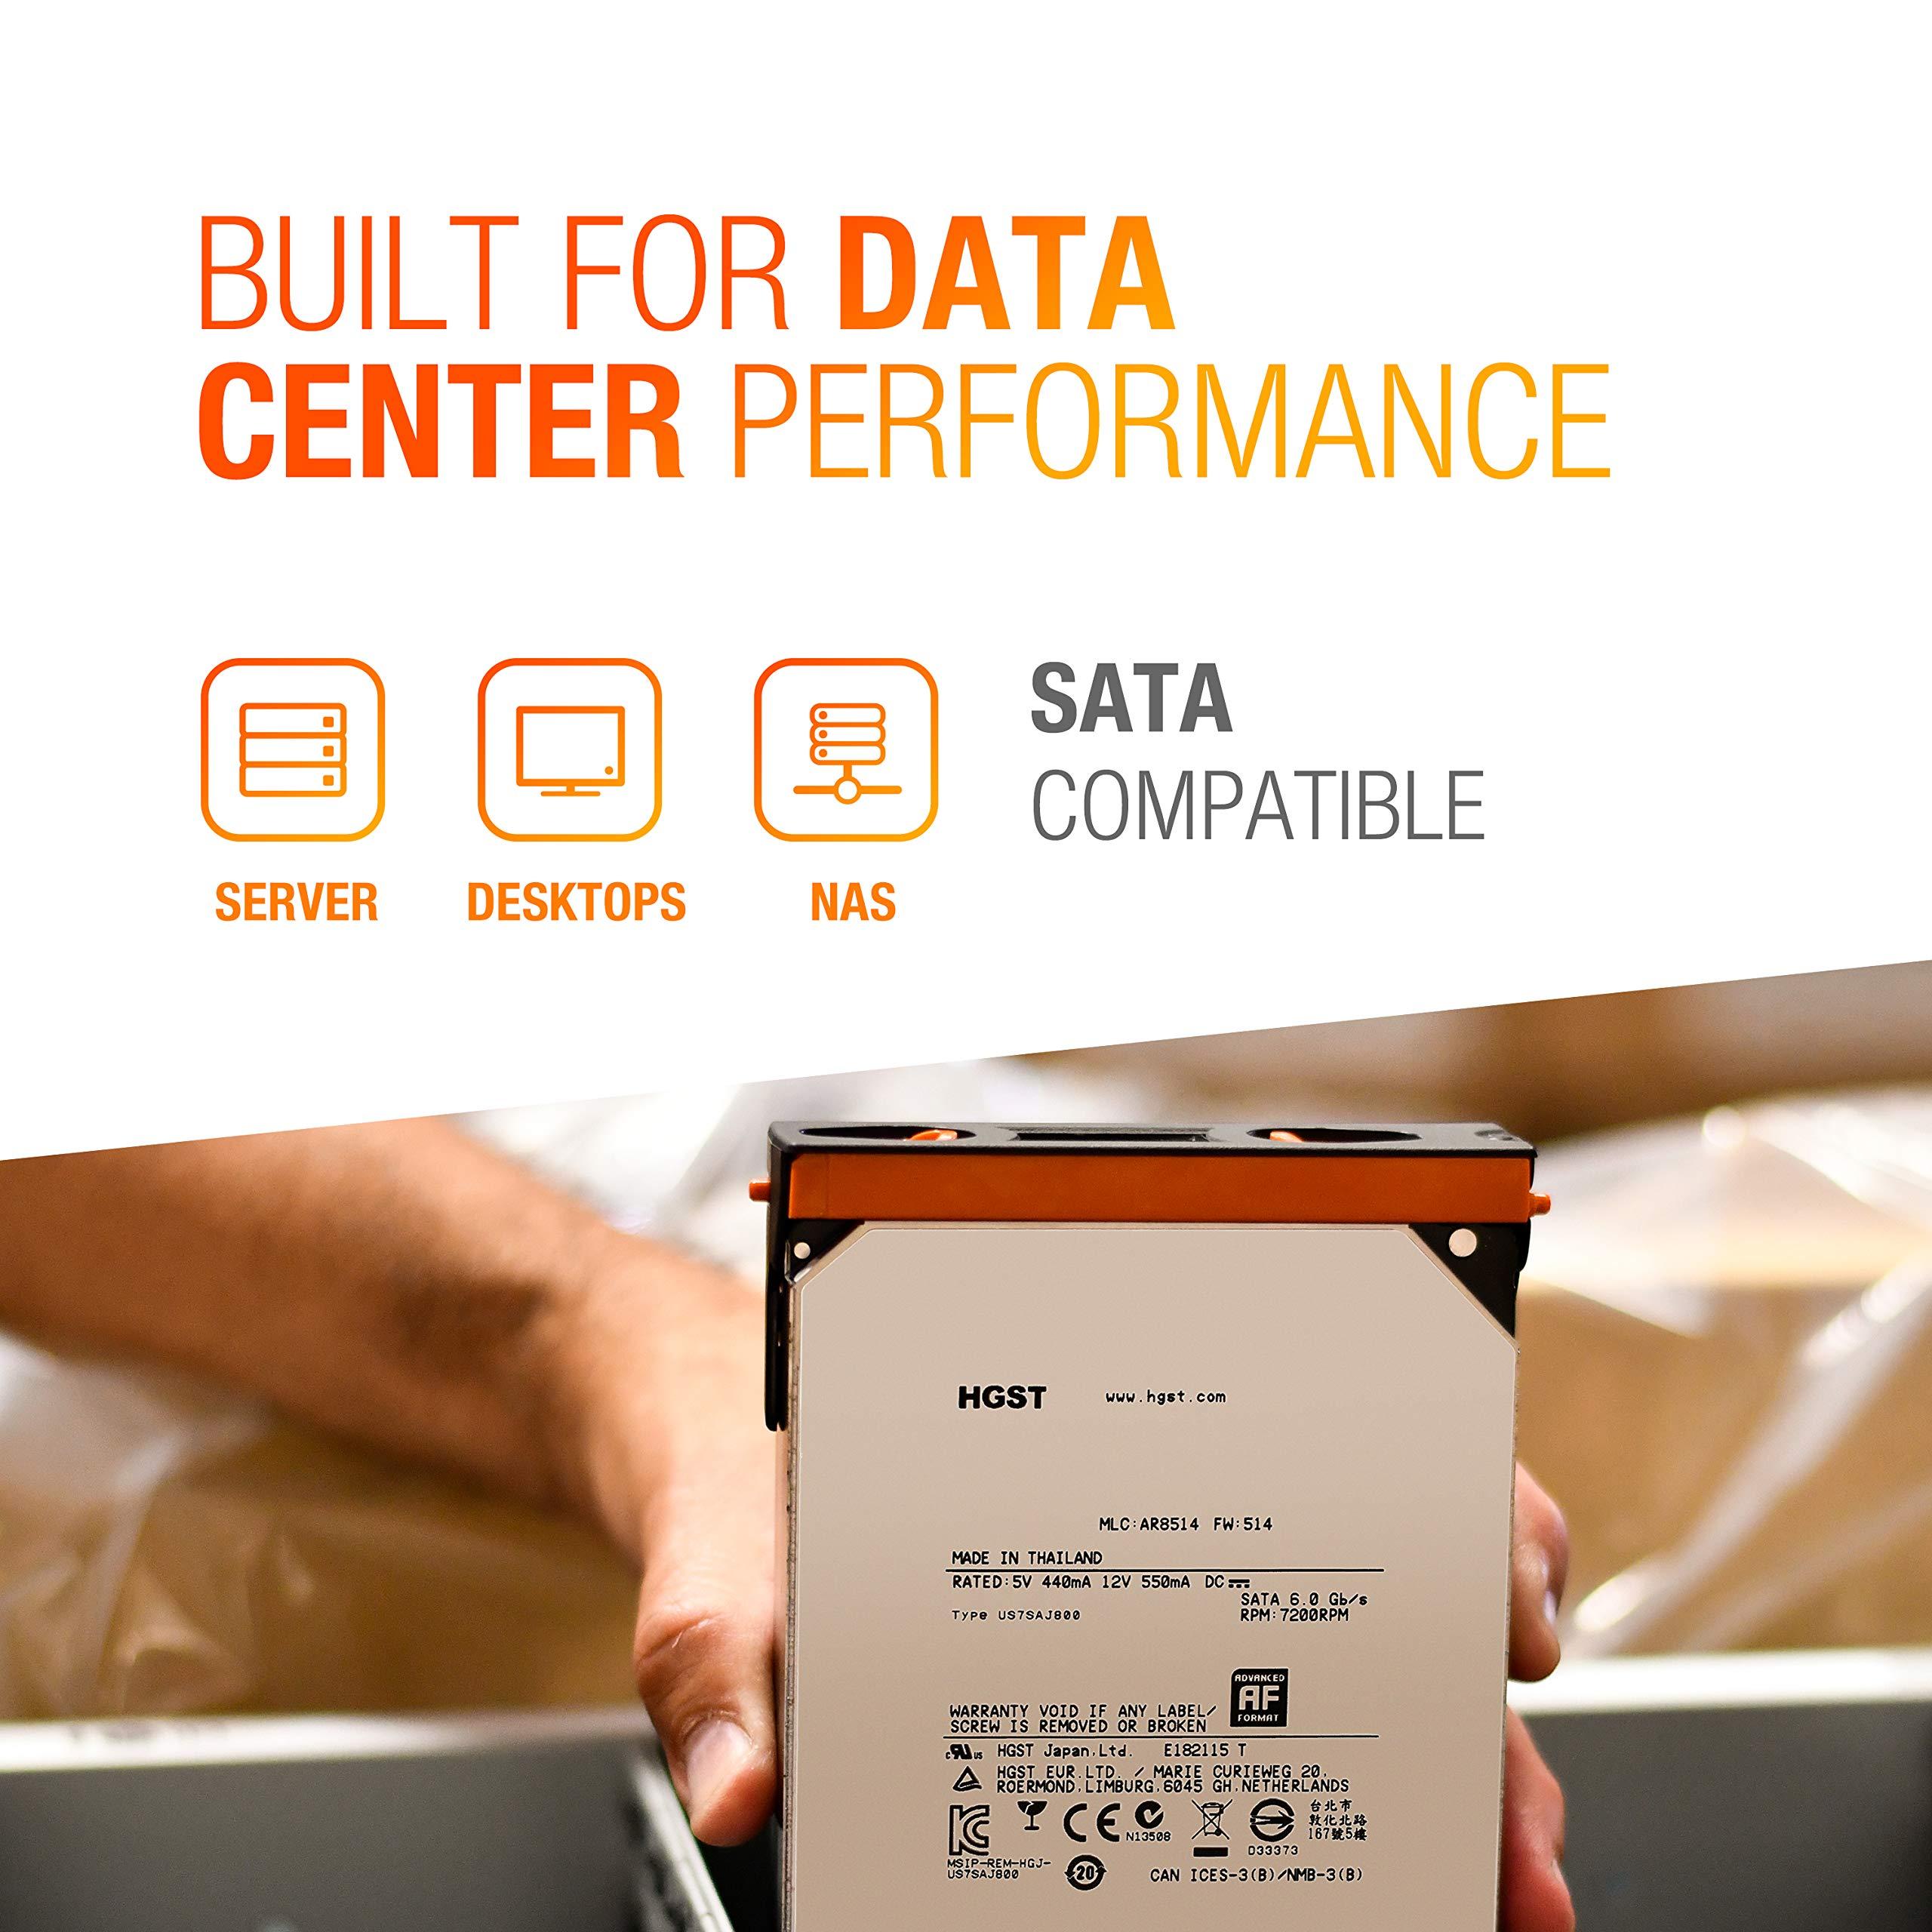 HGST Ultrastar He10 | HUH721010ALE600| 0F27452 | 512e | 10TB SATA 6.0Gb/s 7200 RPM 256MB Cache 3.5in | Enterprise Hard Drive HDD,  (Renewed) by HGST (Image #4)